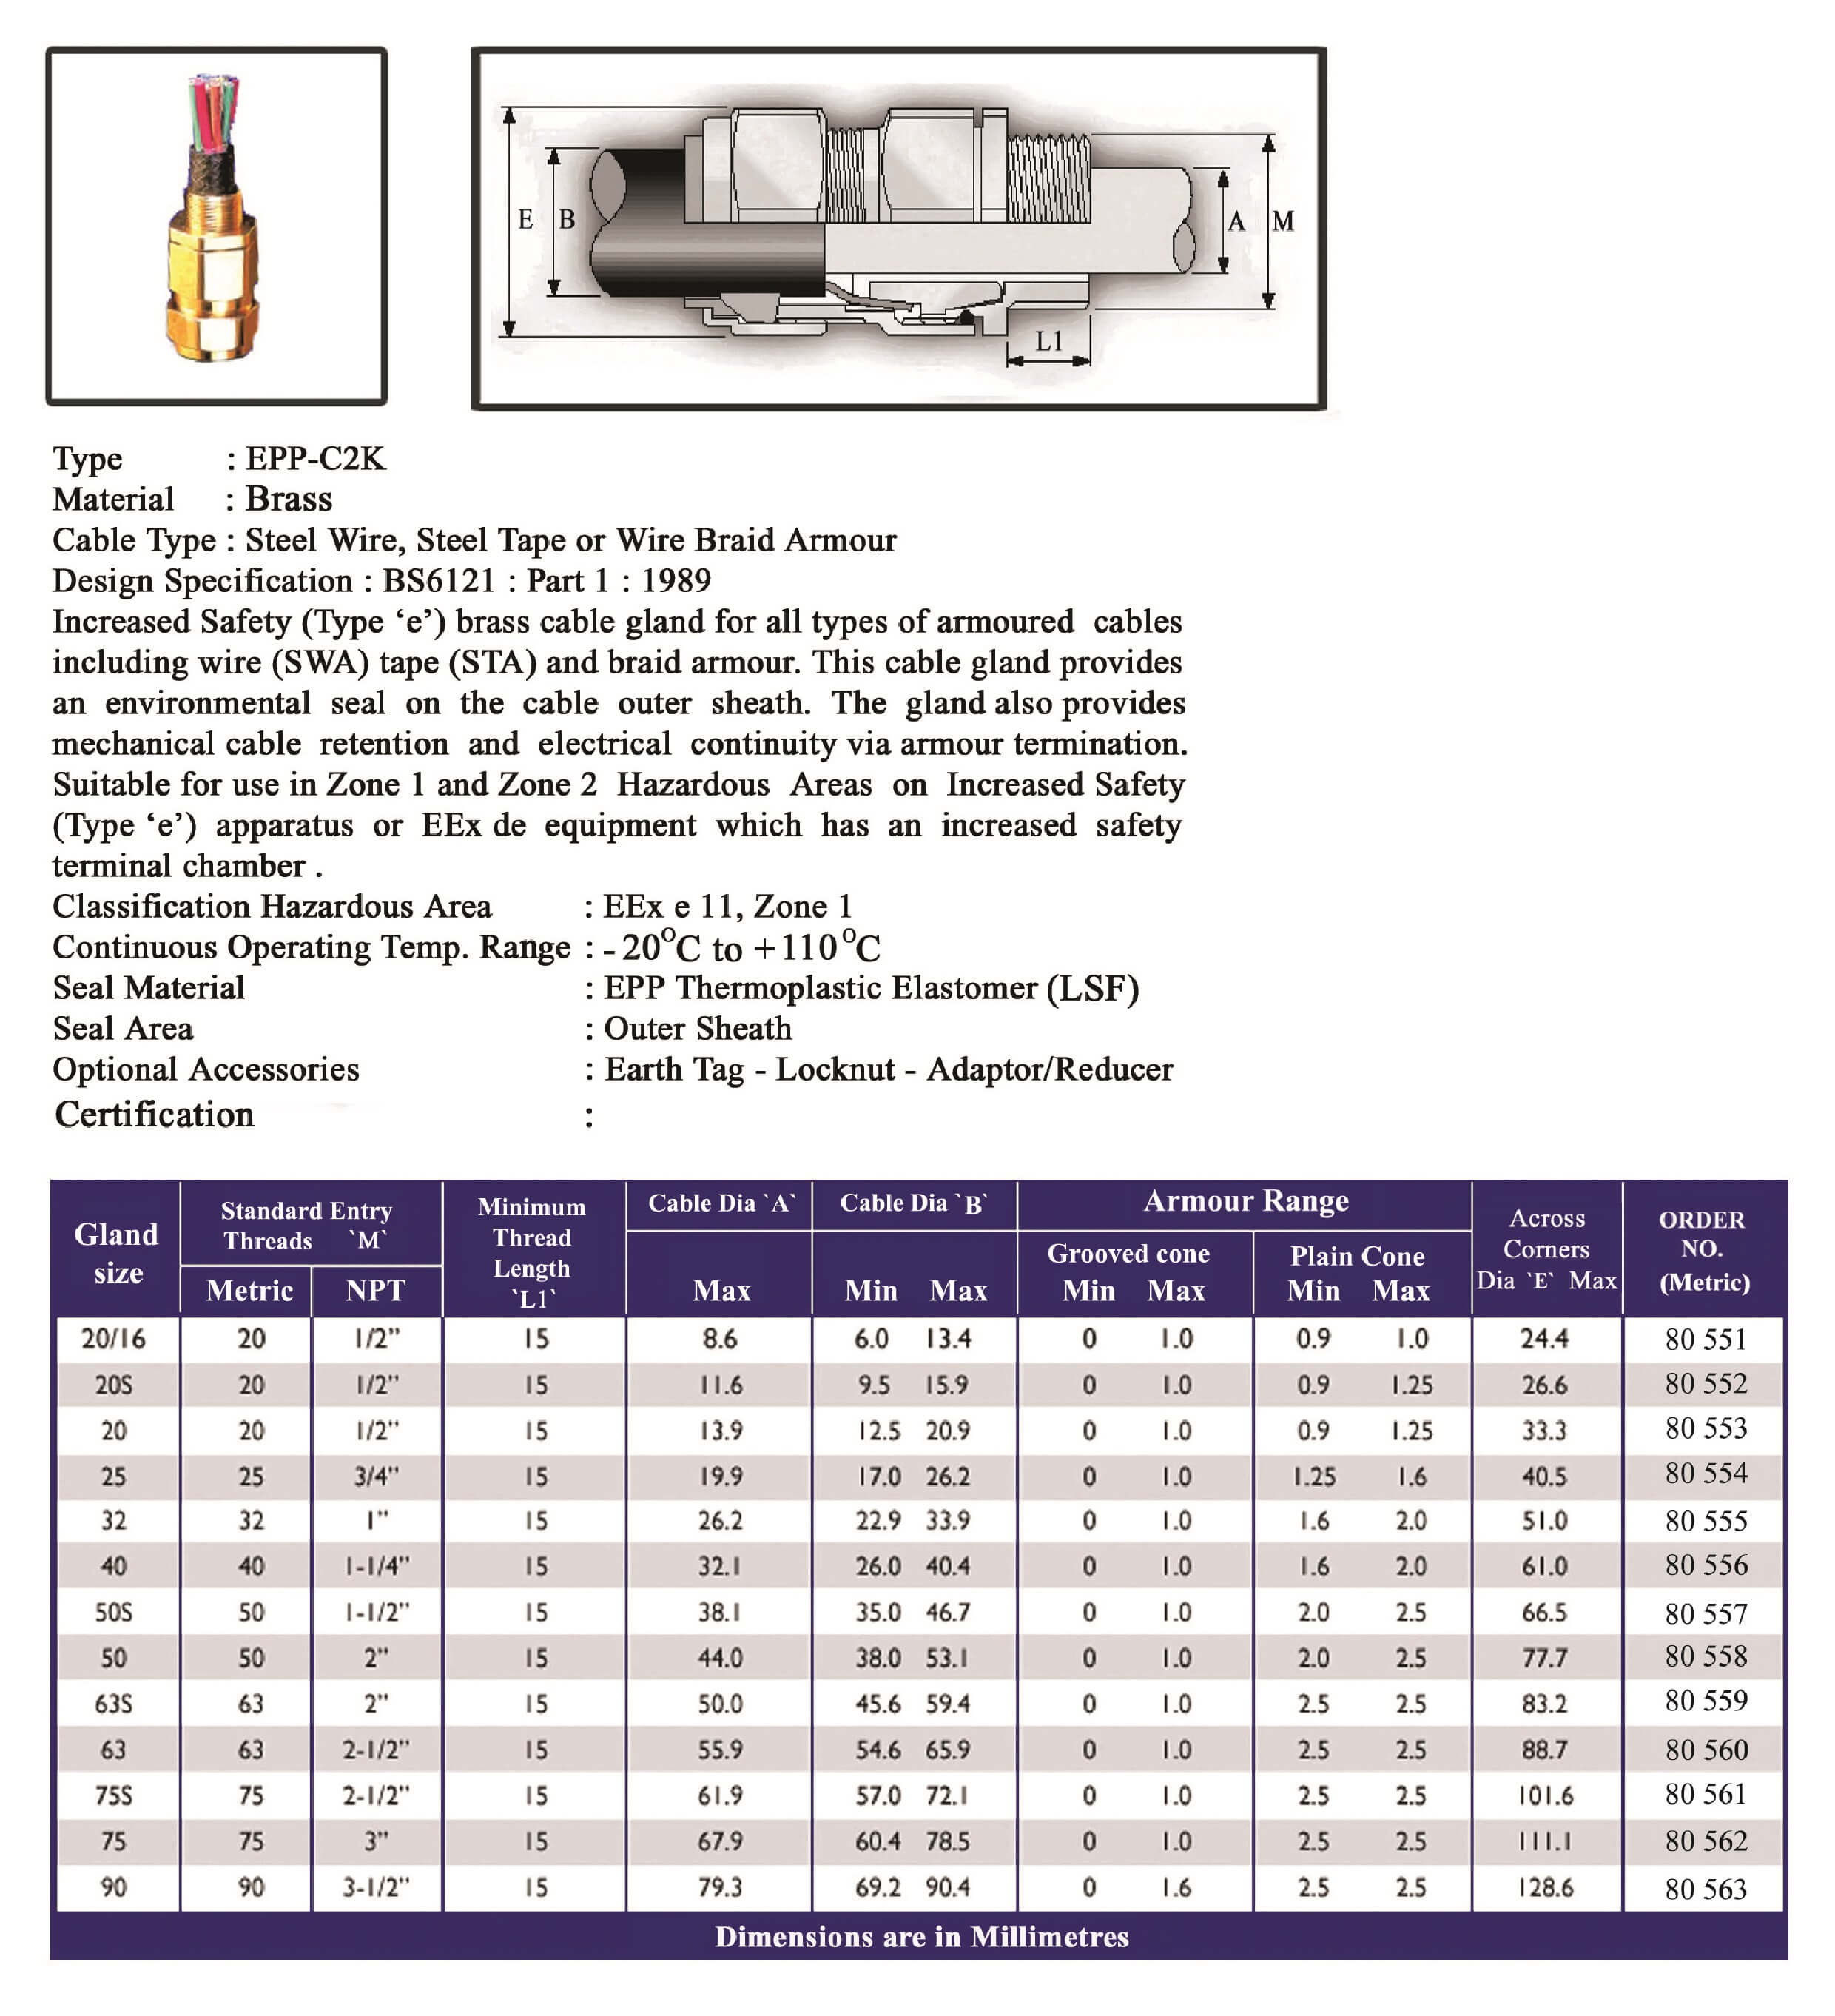 E.P.P - C2K Technical Datasheet